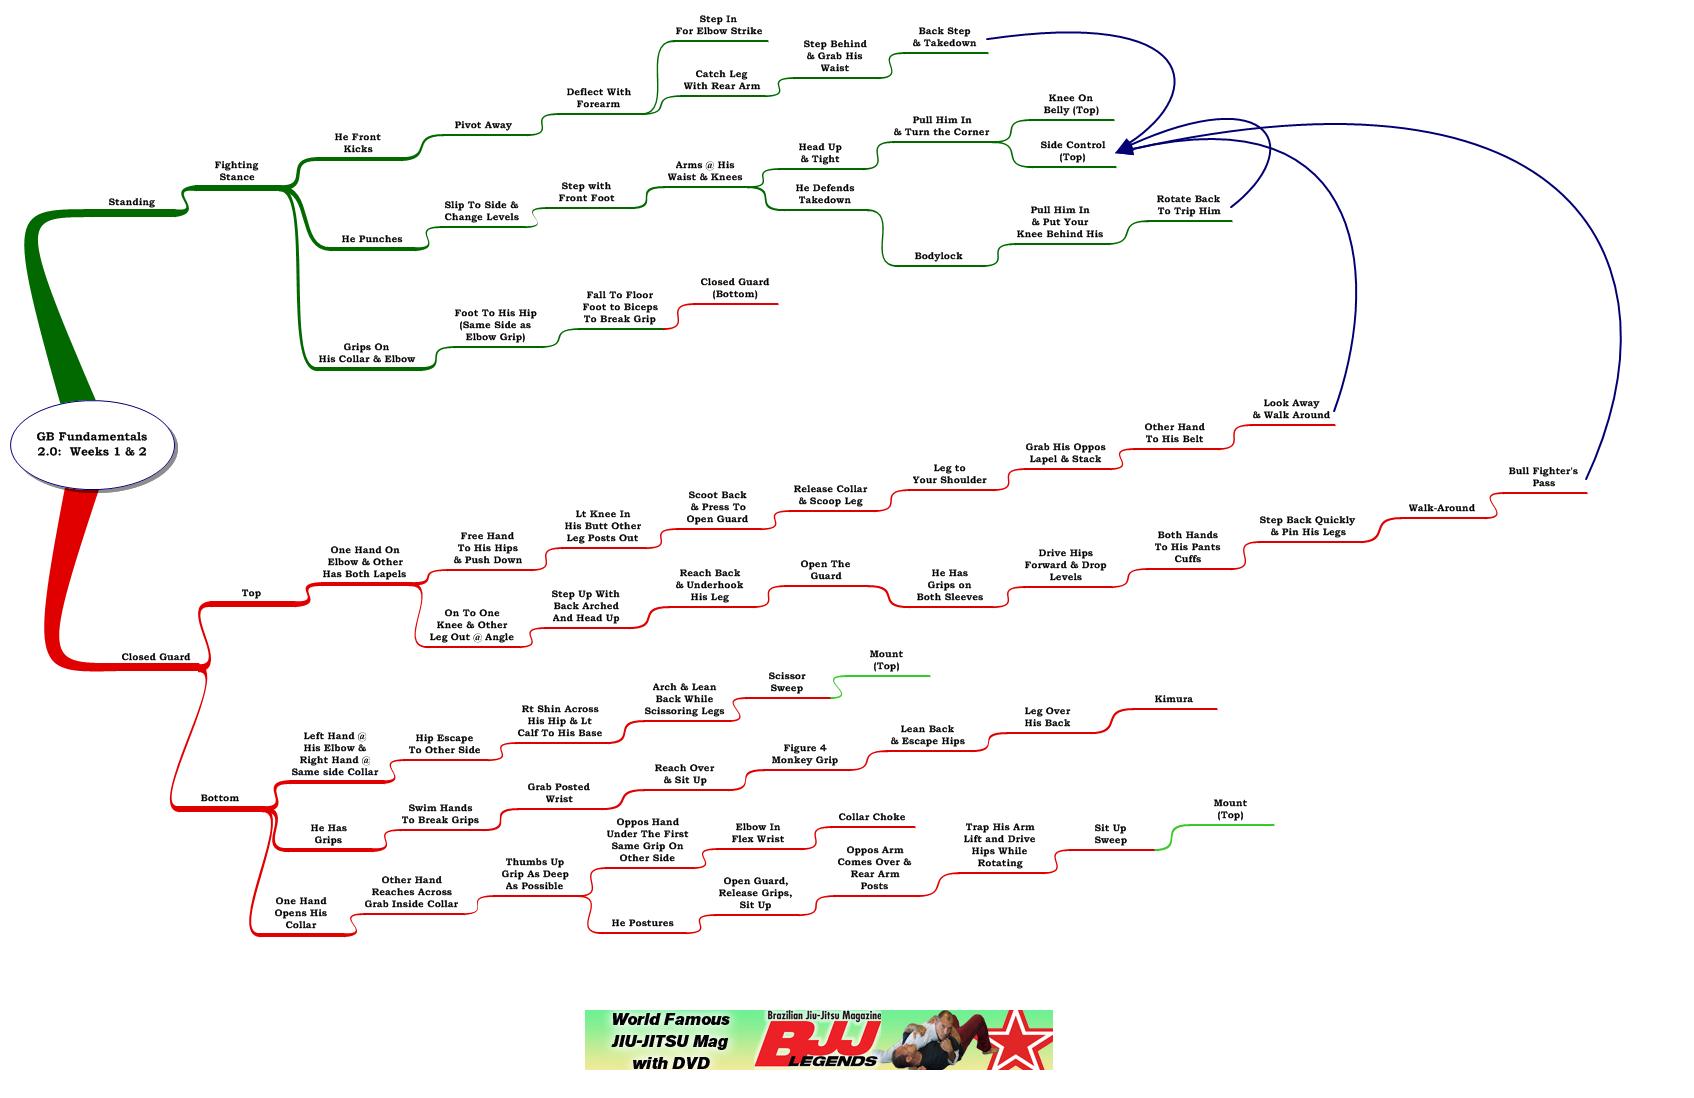 Review and Mindmap: Gracie Barra Fundamentals 2.0 Weeks 1 & 2